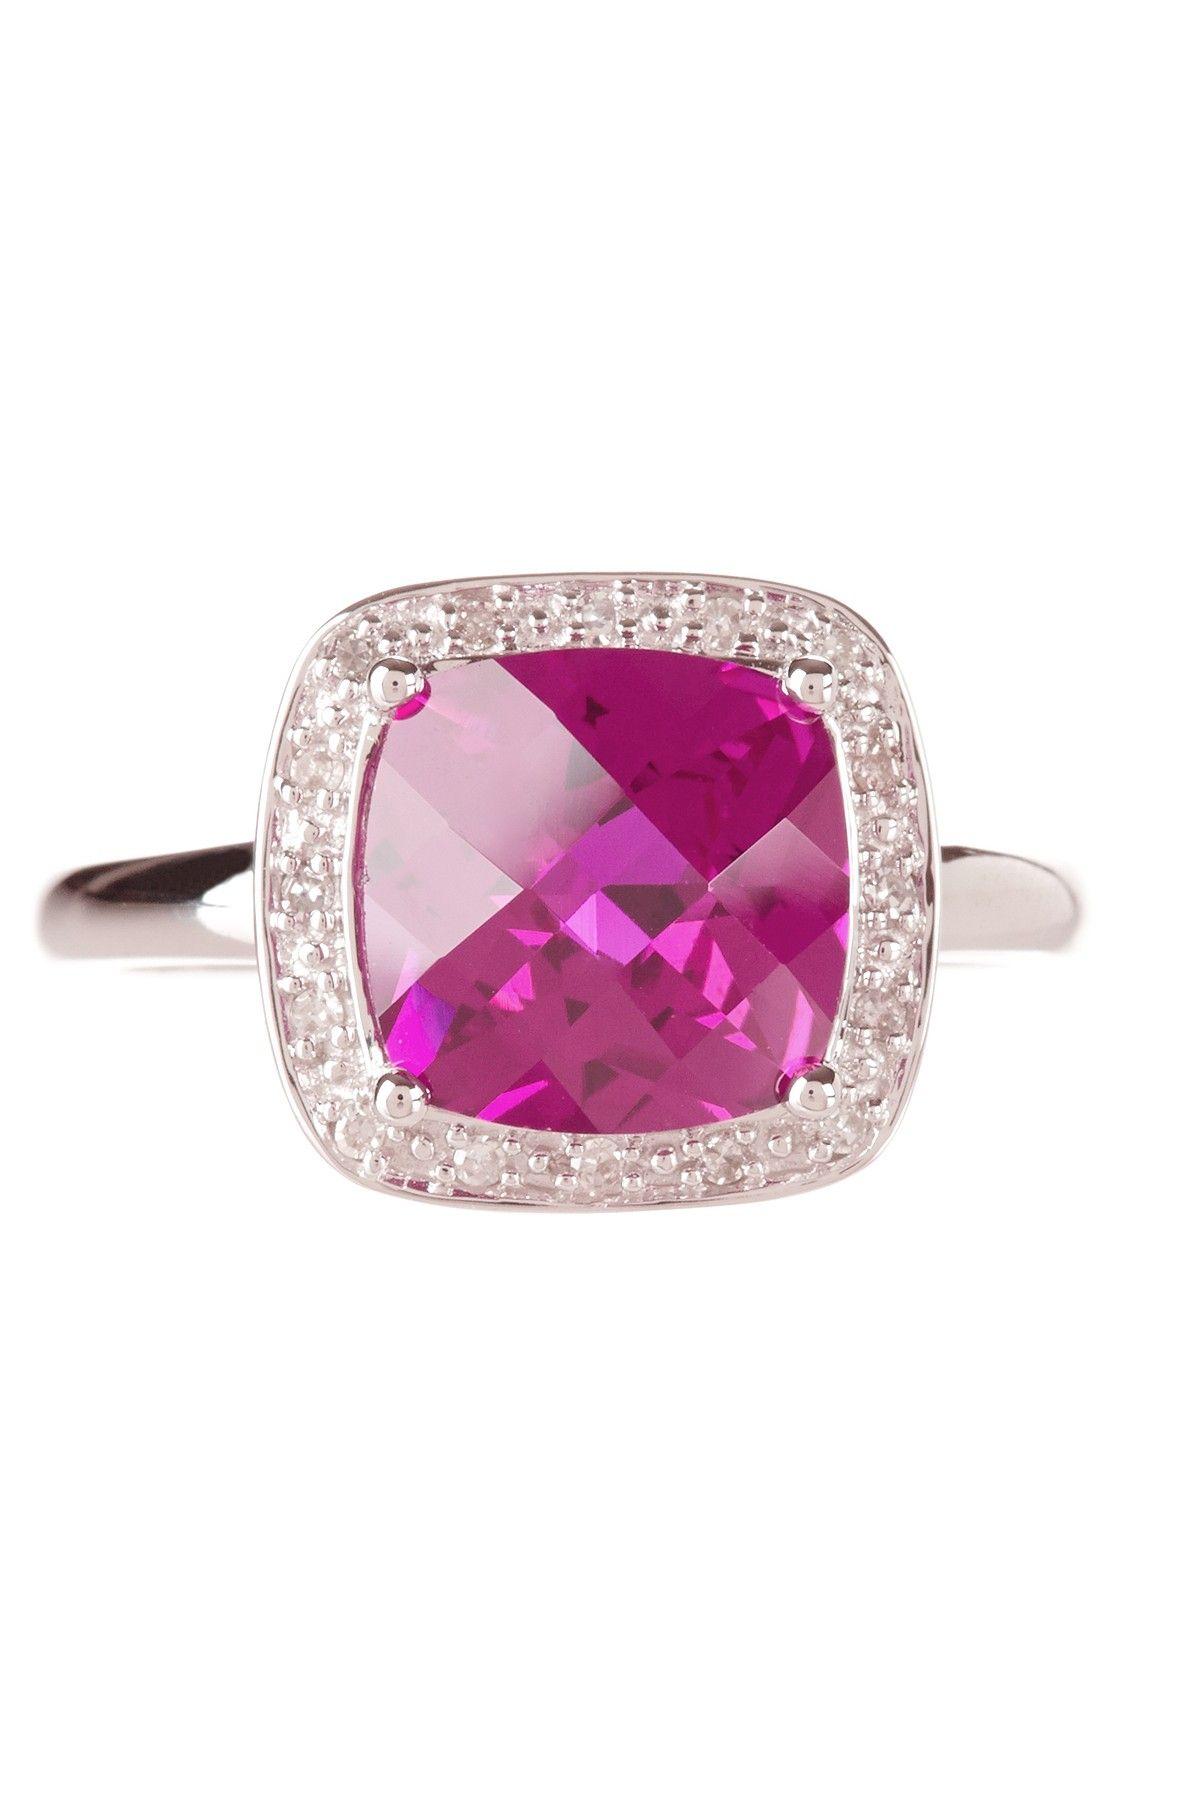 10K White Gold Cushion Cut Pink Sapphire & Diamond Halo Ring ...